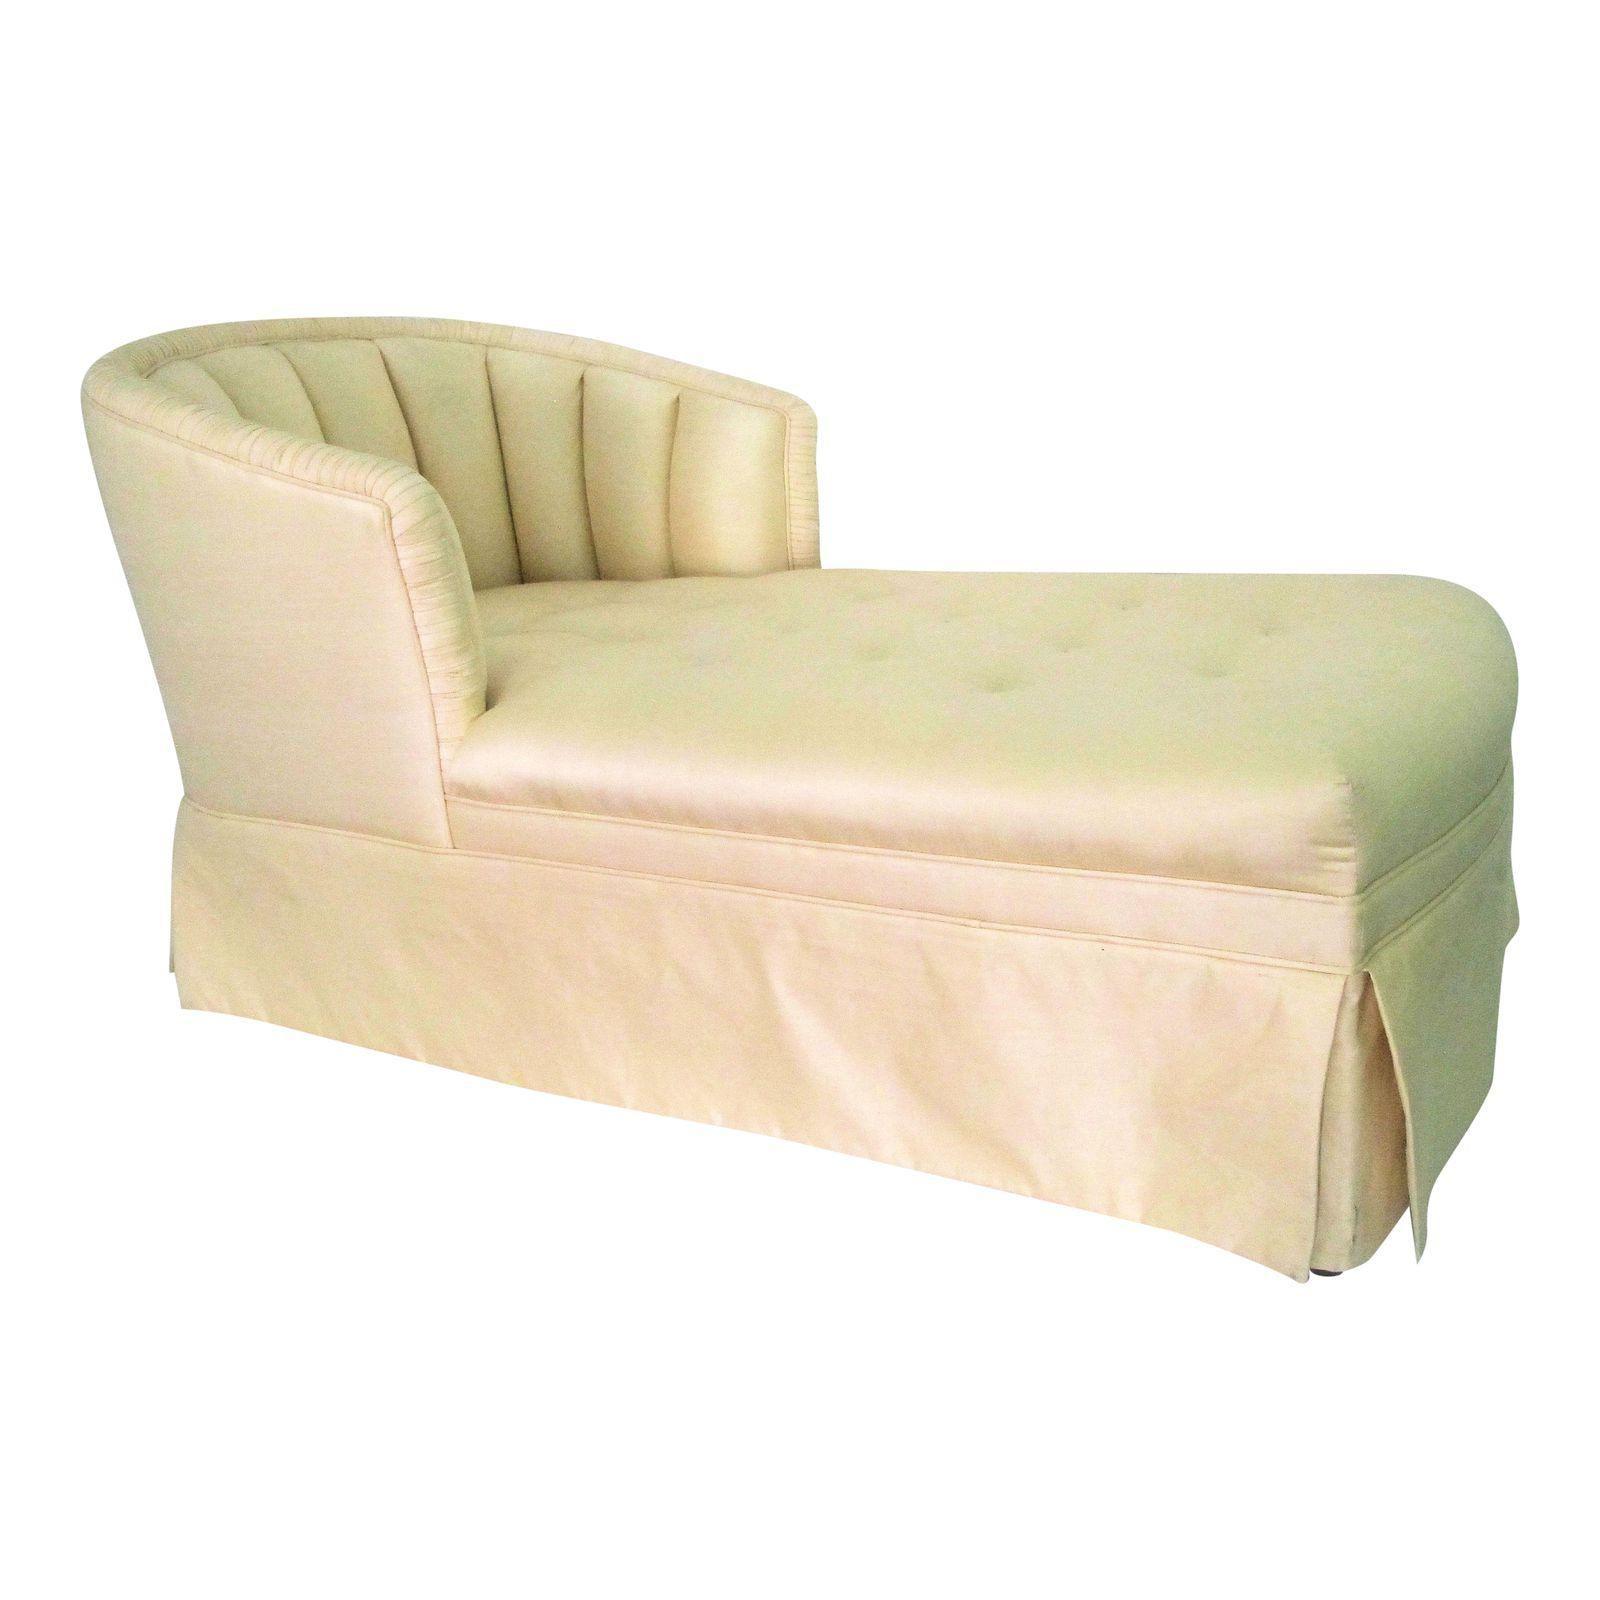 Pleasing Image Of Vintage Silk Chaise Lounge Sofas Settees Creativecarmelina Interior Chair Design Creativecarmelinacom